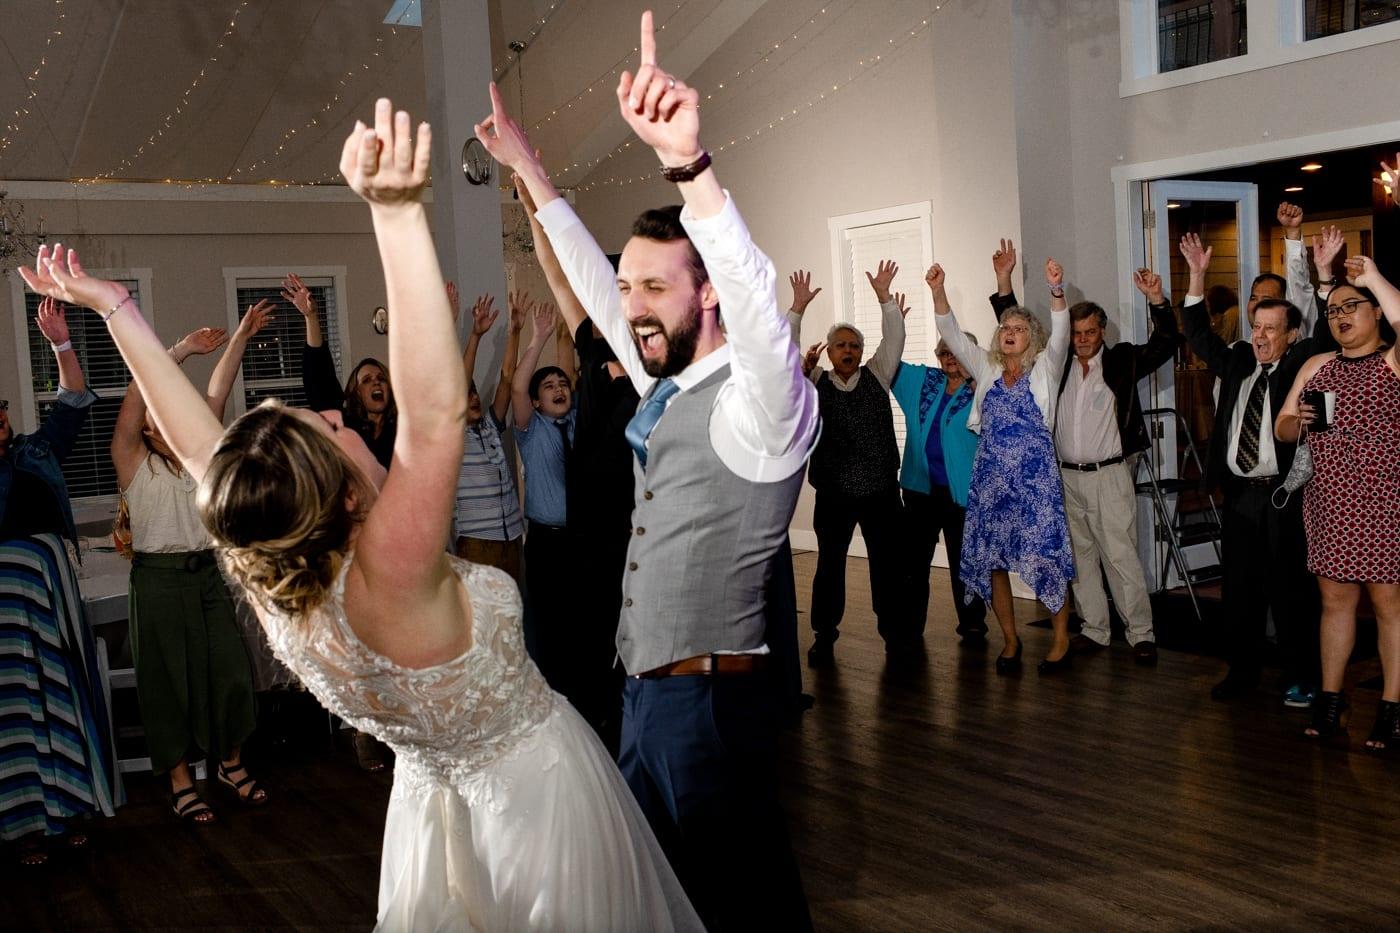 Wedding-Dancing-Trinity-Tree-Farm-Wedding-Photos-Greener-Visuals